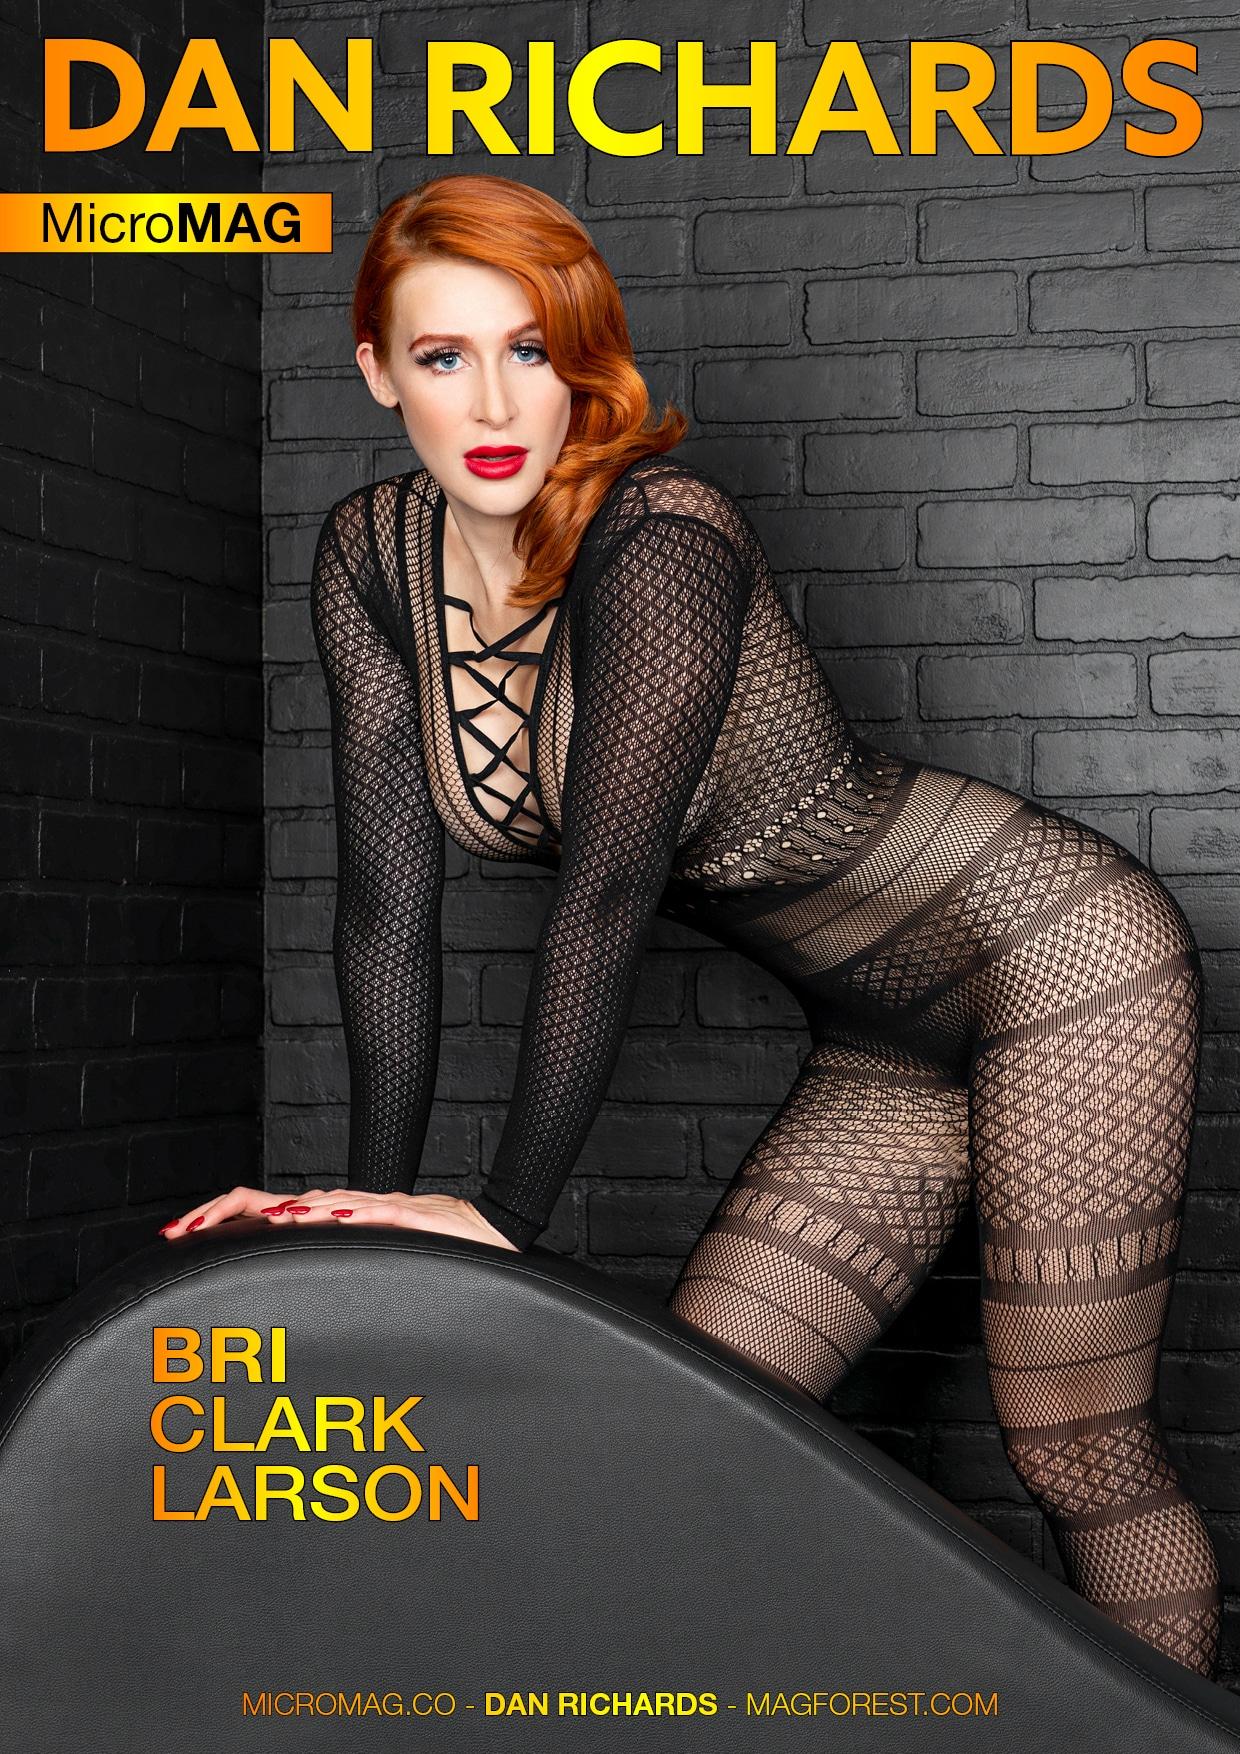 Dan Richards MicroMAG - Bri Clark Larson - Issue 4